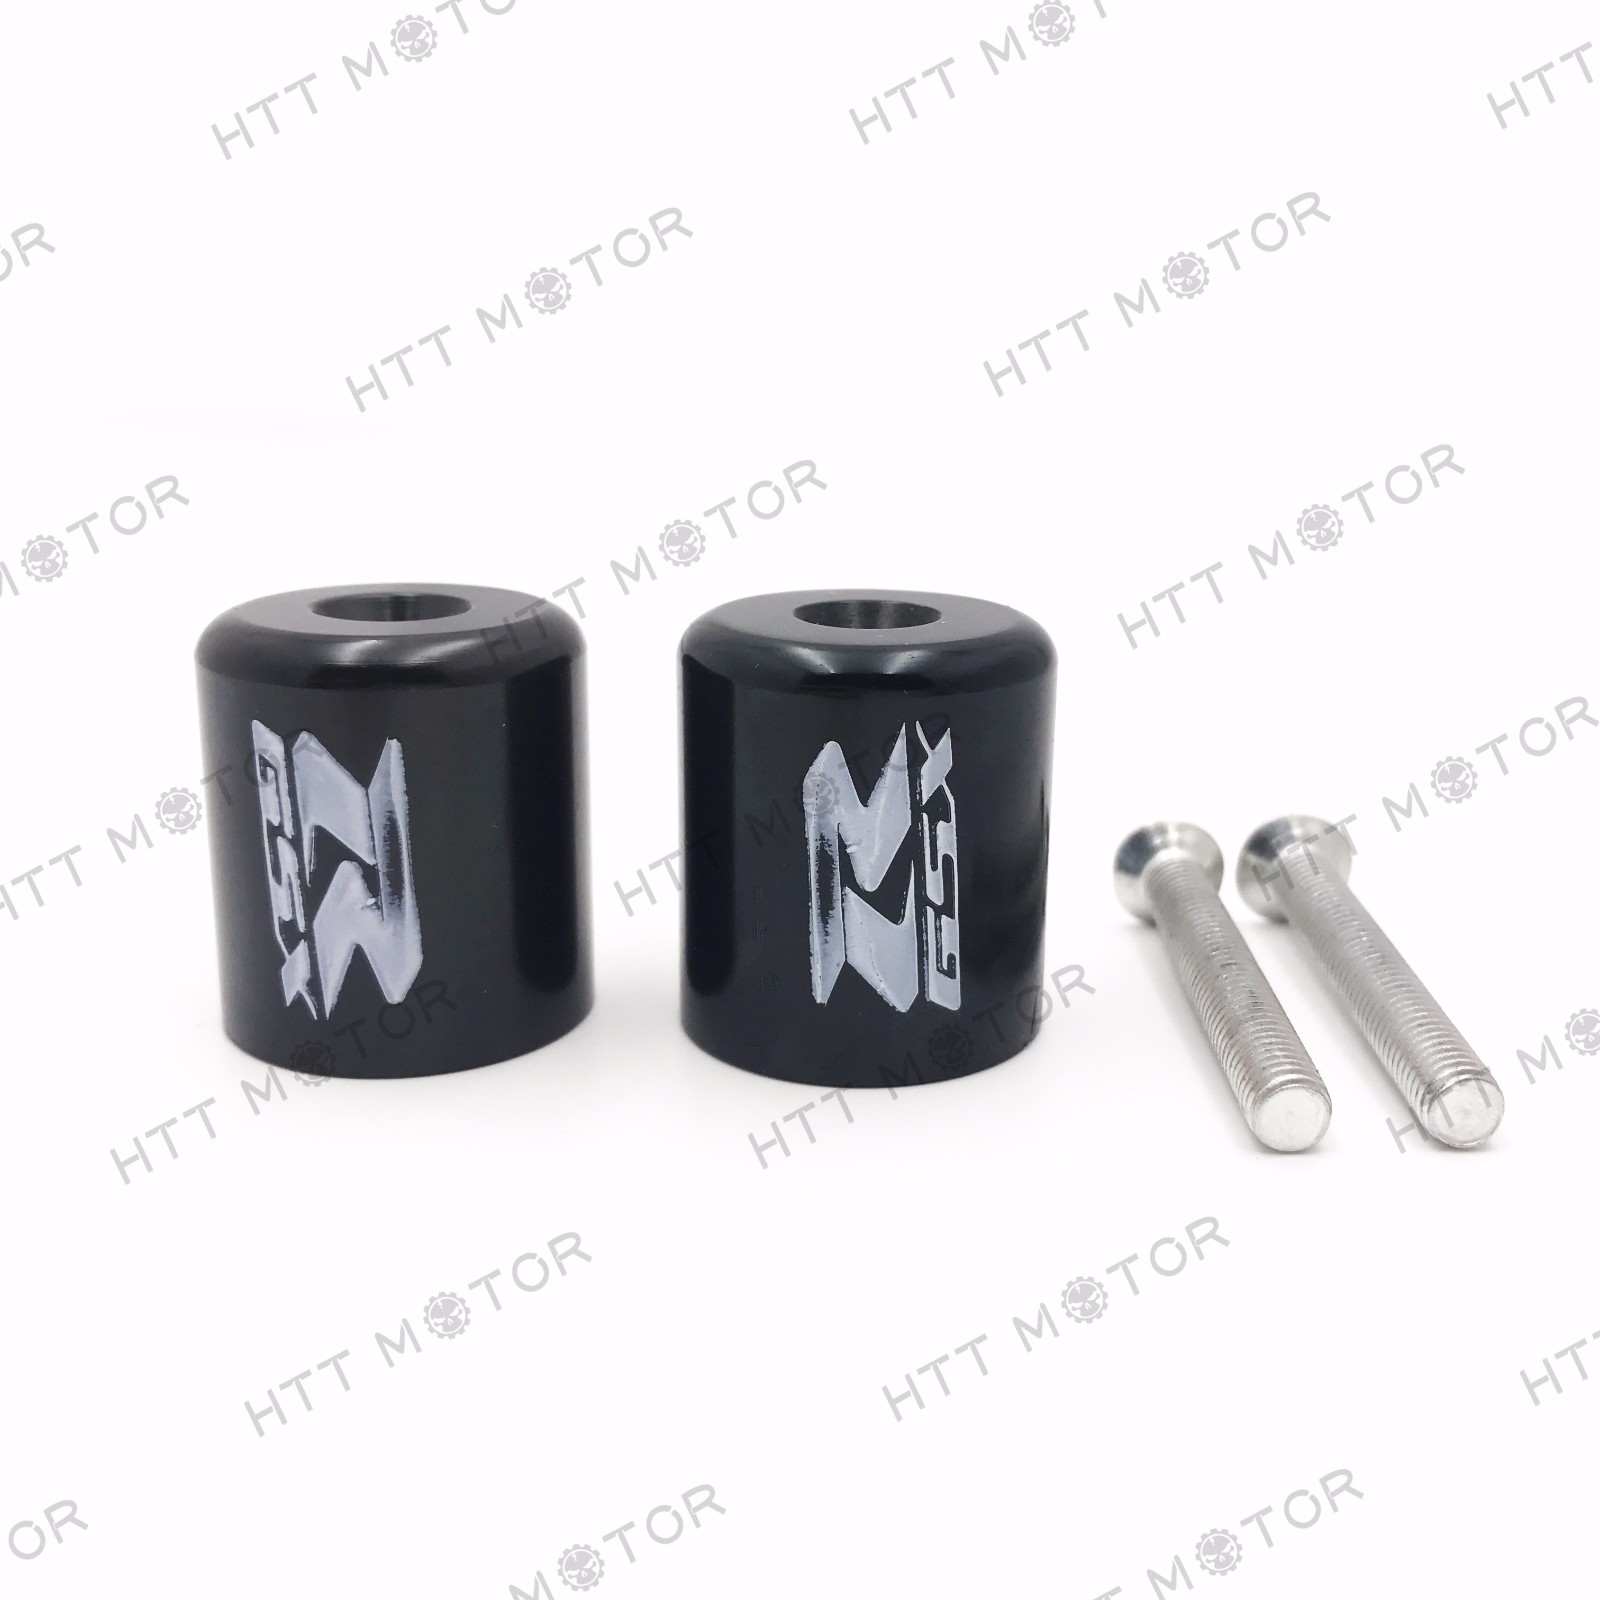 "HTTMT- Black Hand Bar End For Suzuki GSXR600 92-14/GSXR750 96-14/GSXR1000 01-14 ""GSXR"""